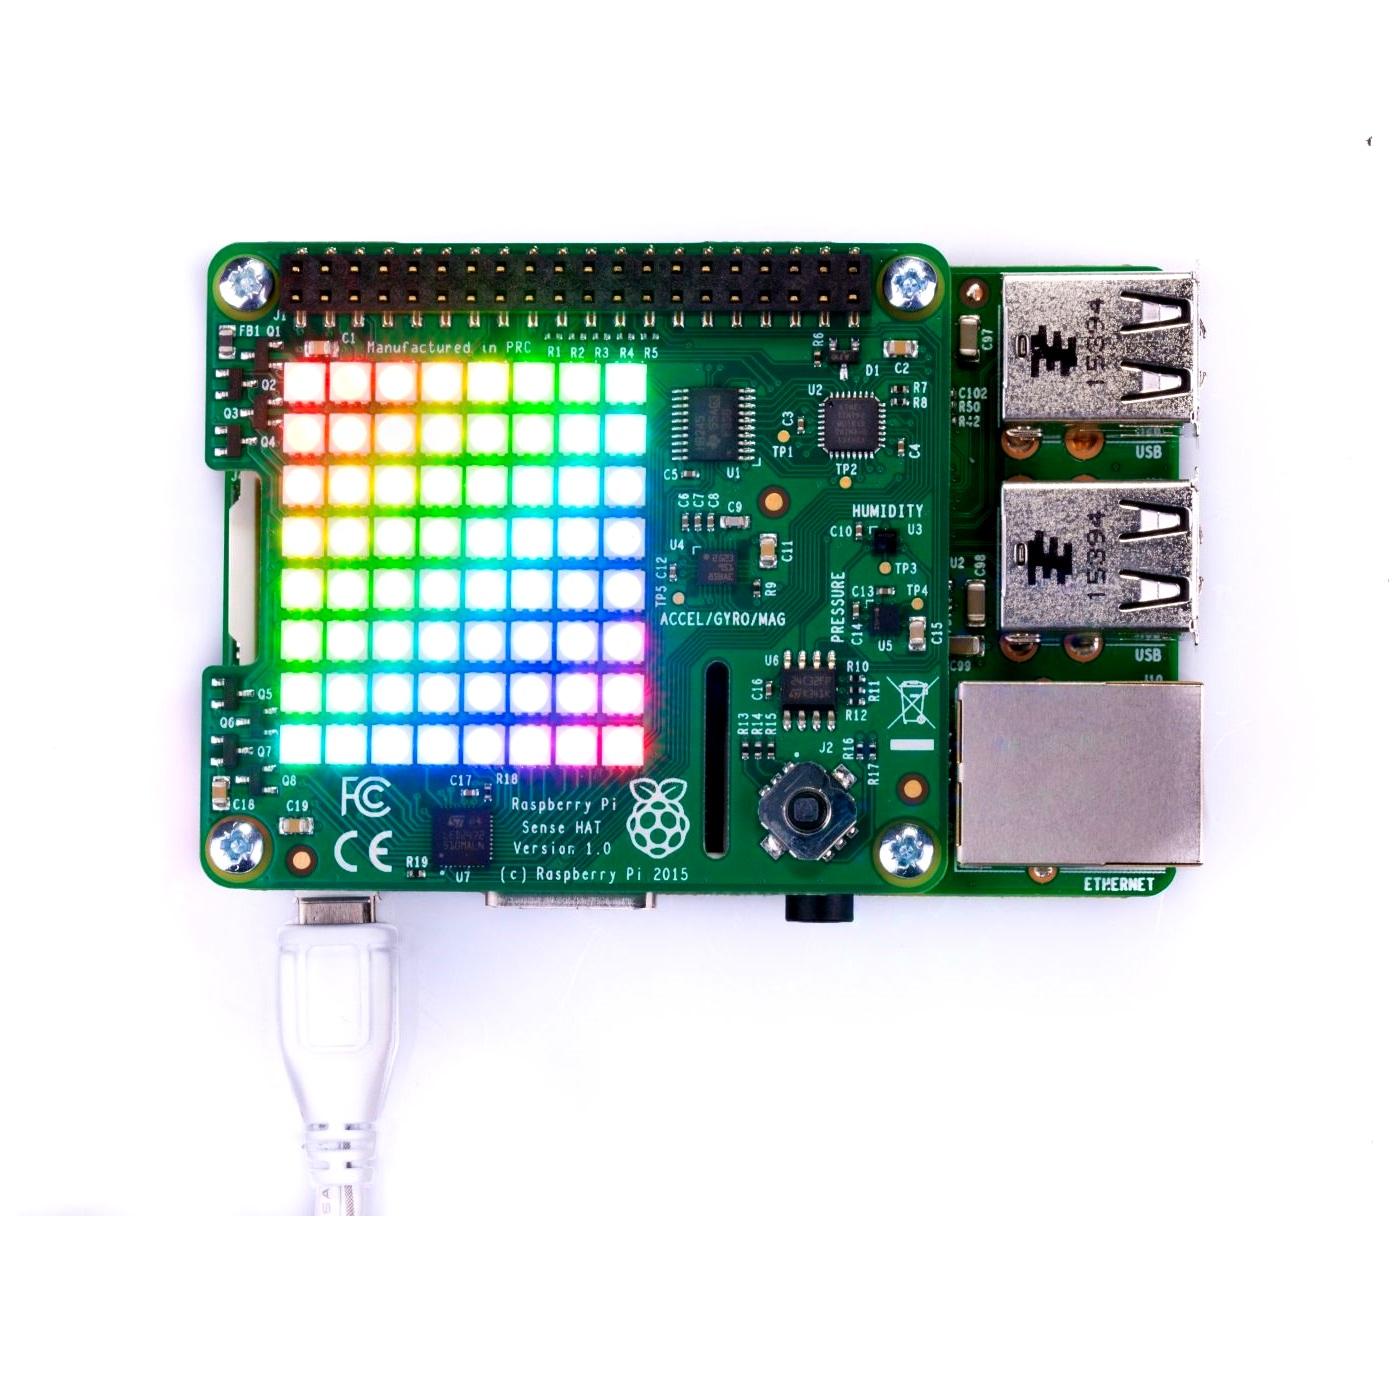 Raspberry Pi Sense HAT for the Pi 3/2/B+/A+ Model